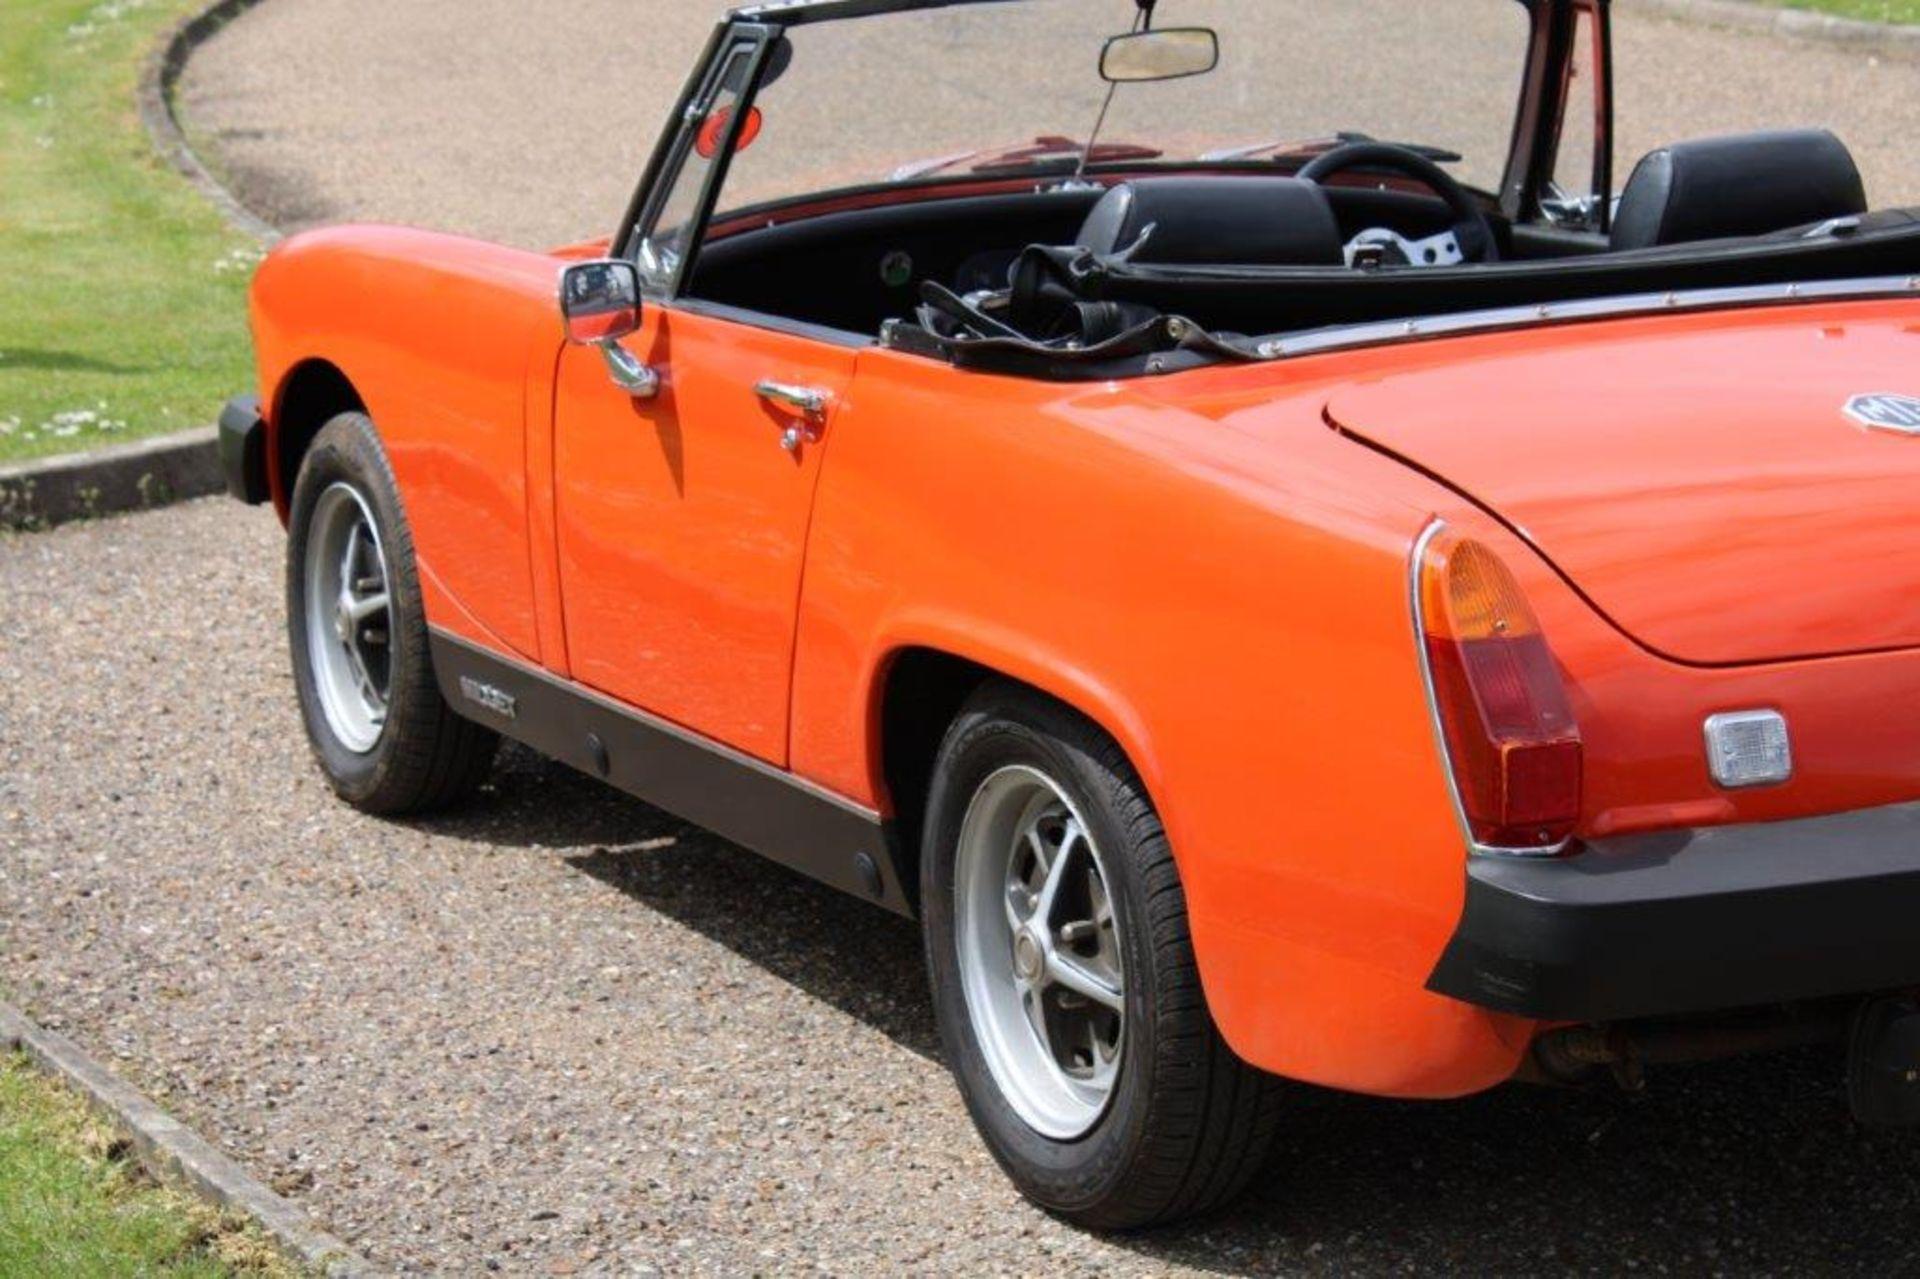 1979 MG Midget 1500 - Image 7 of 37